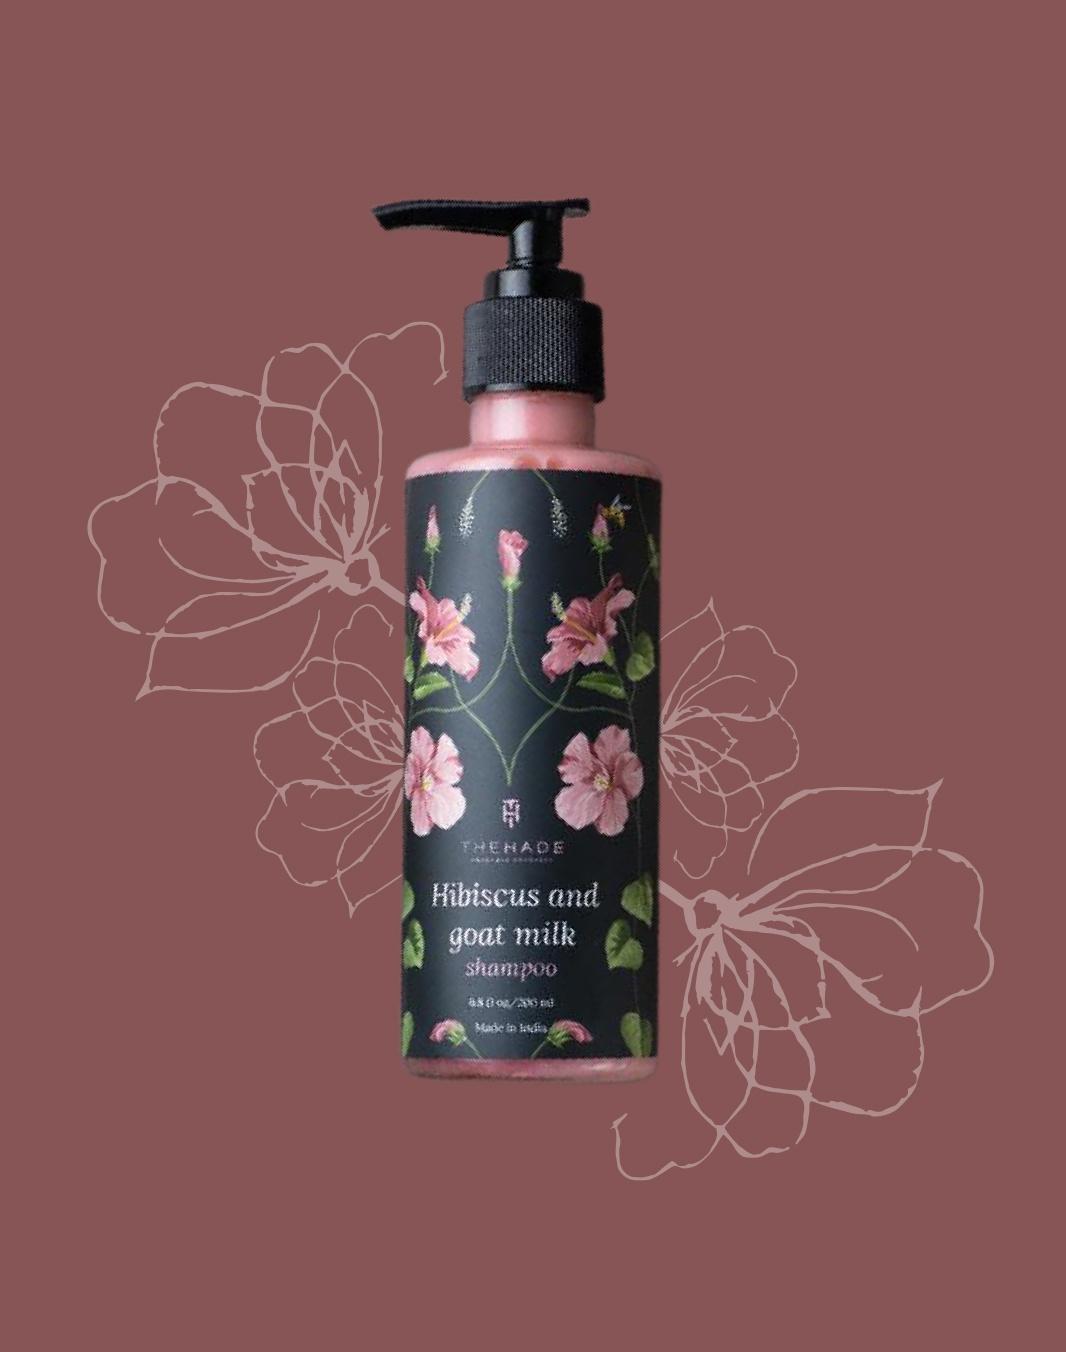 Hibiscus and Goat Milk Shampoo